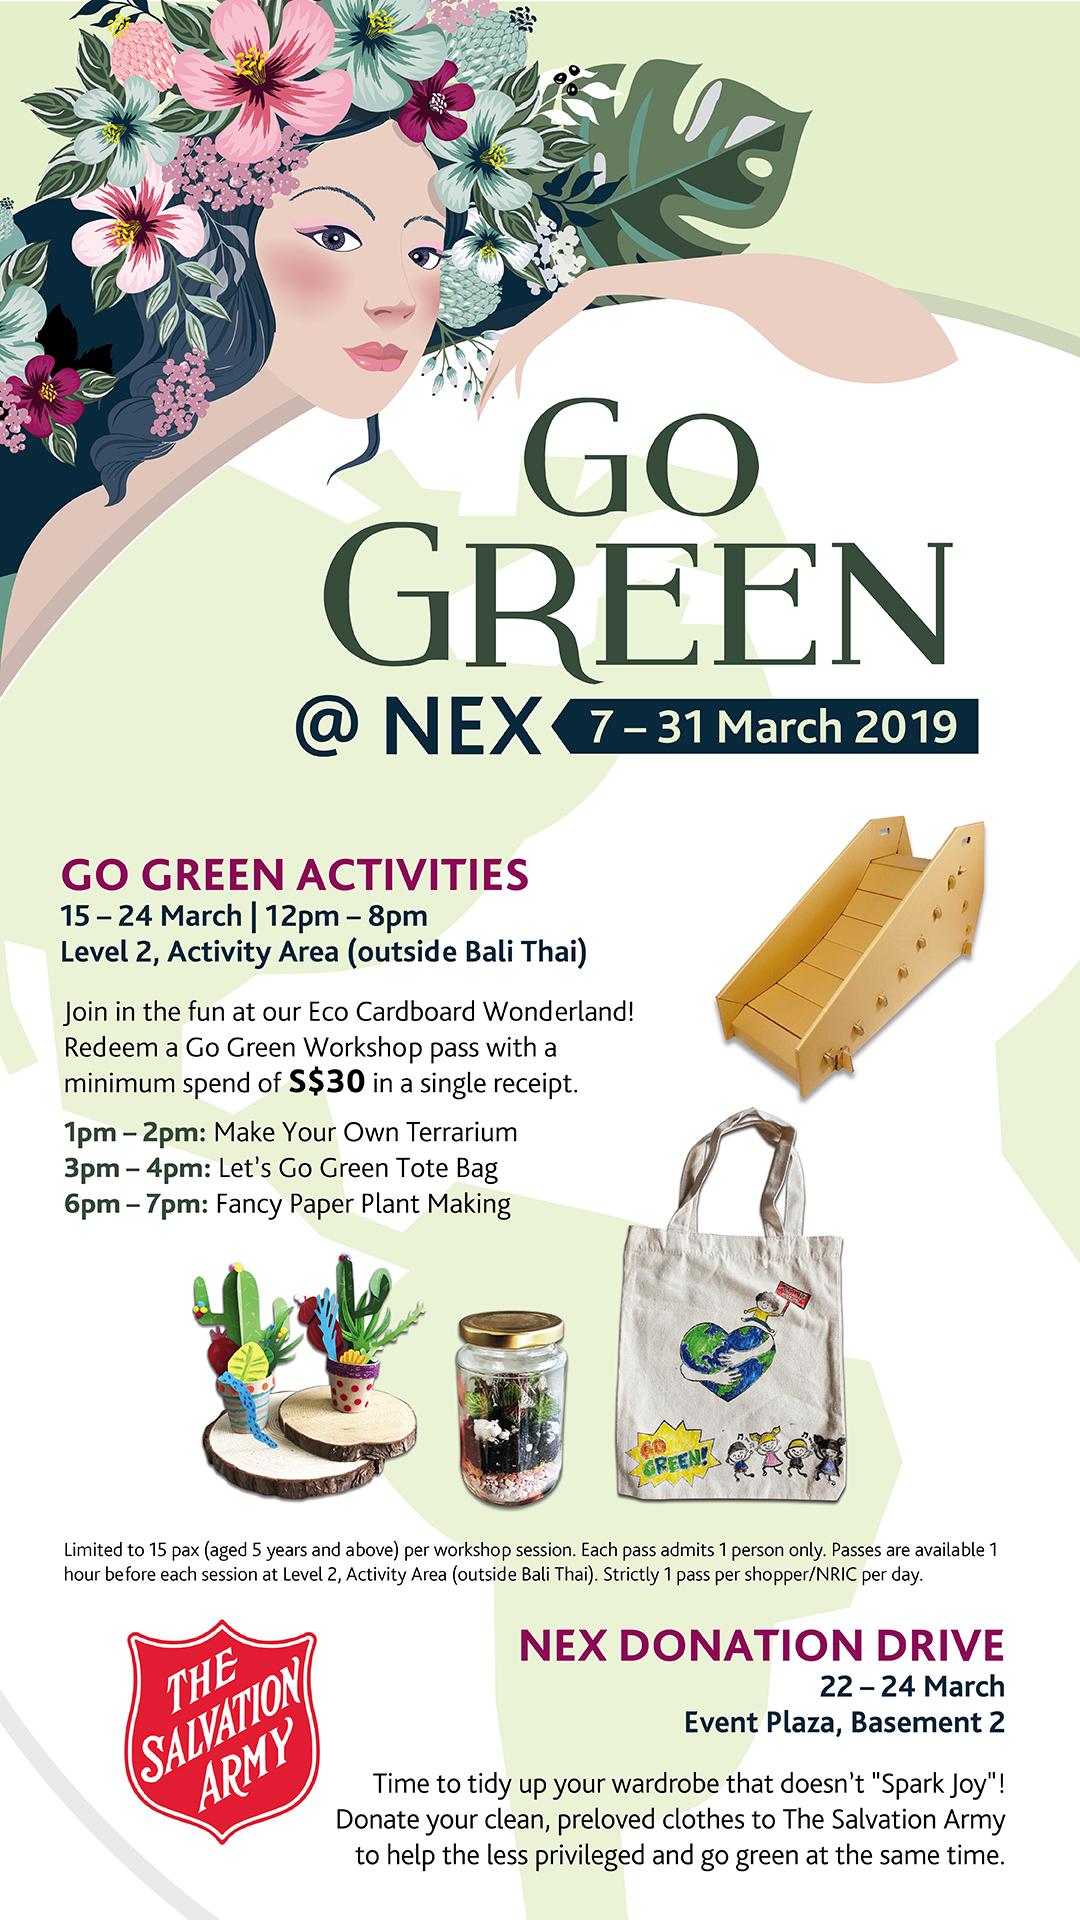 4006NEX_Go Green LCD Screen (2)_FA